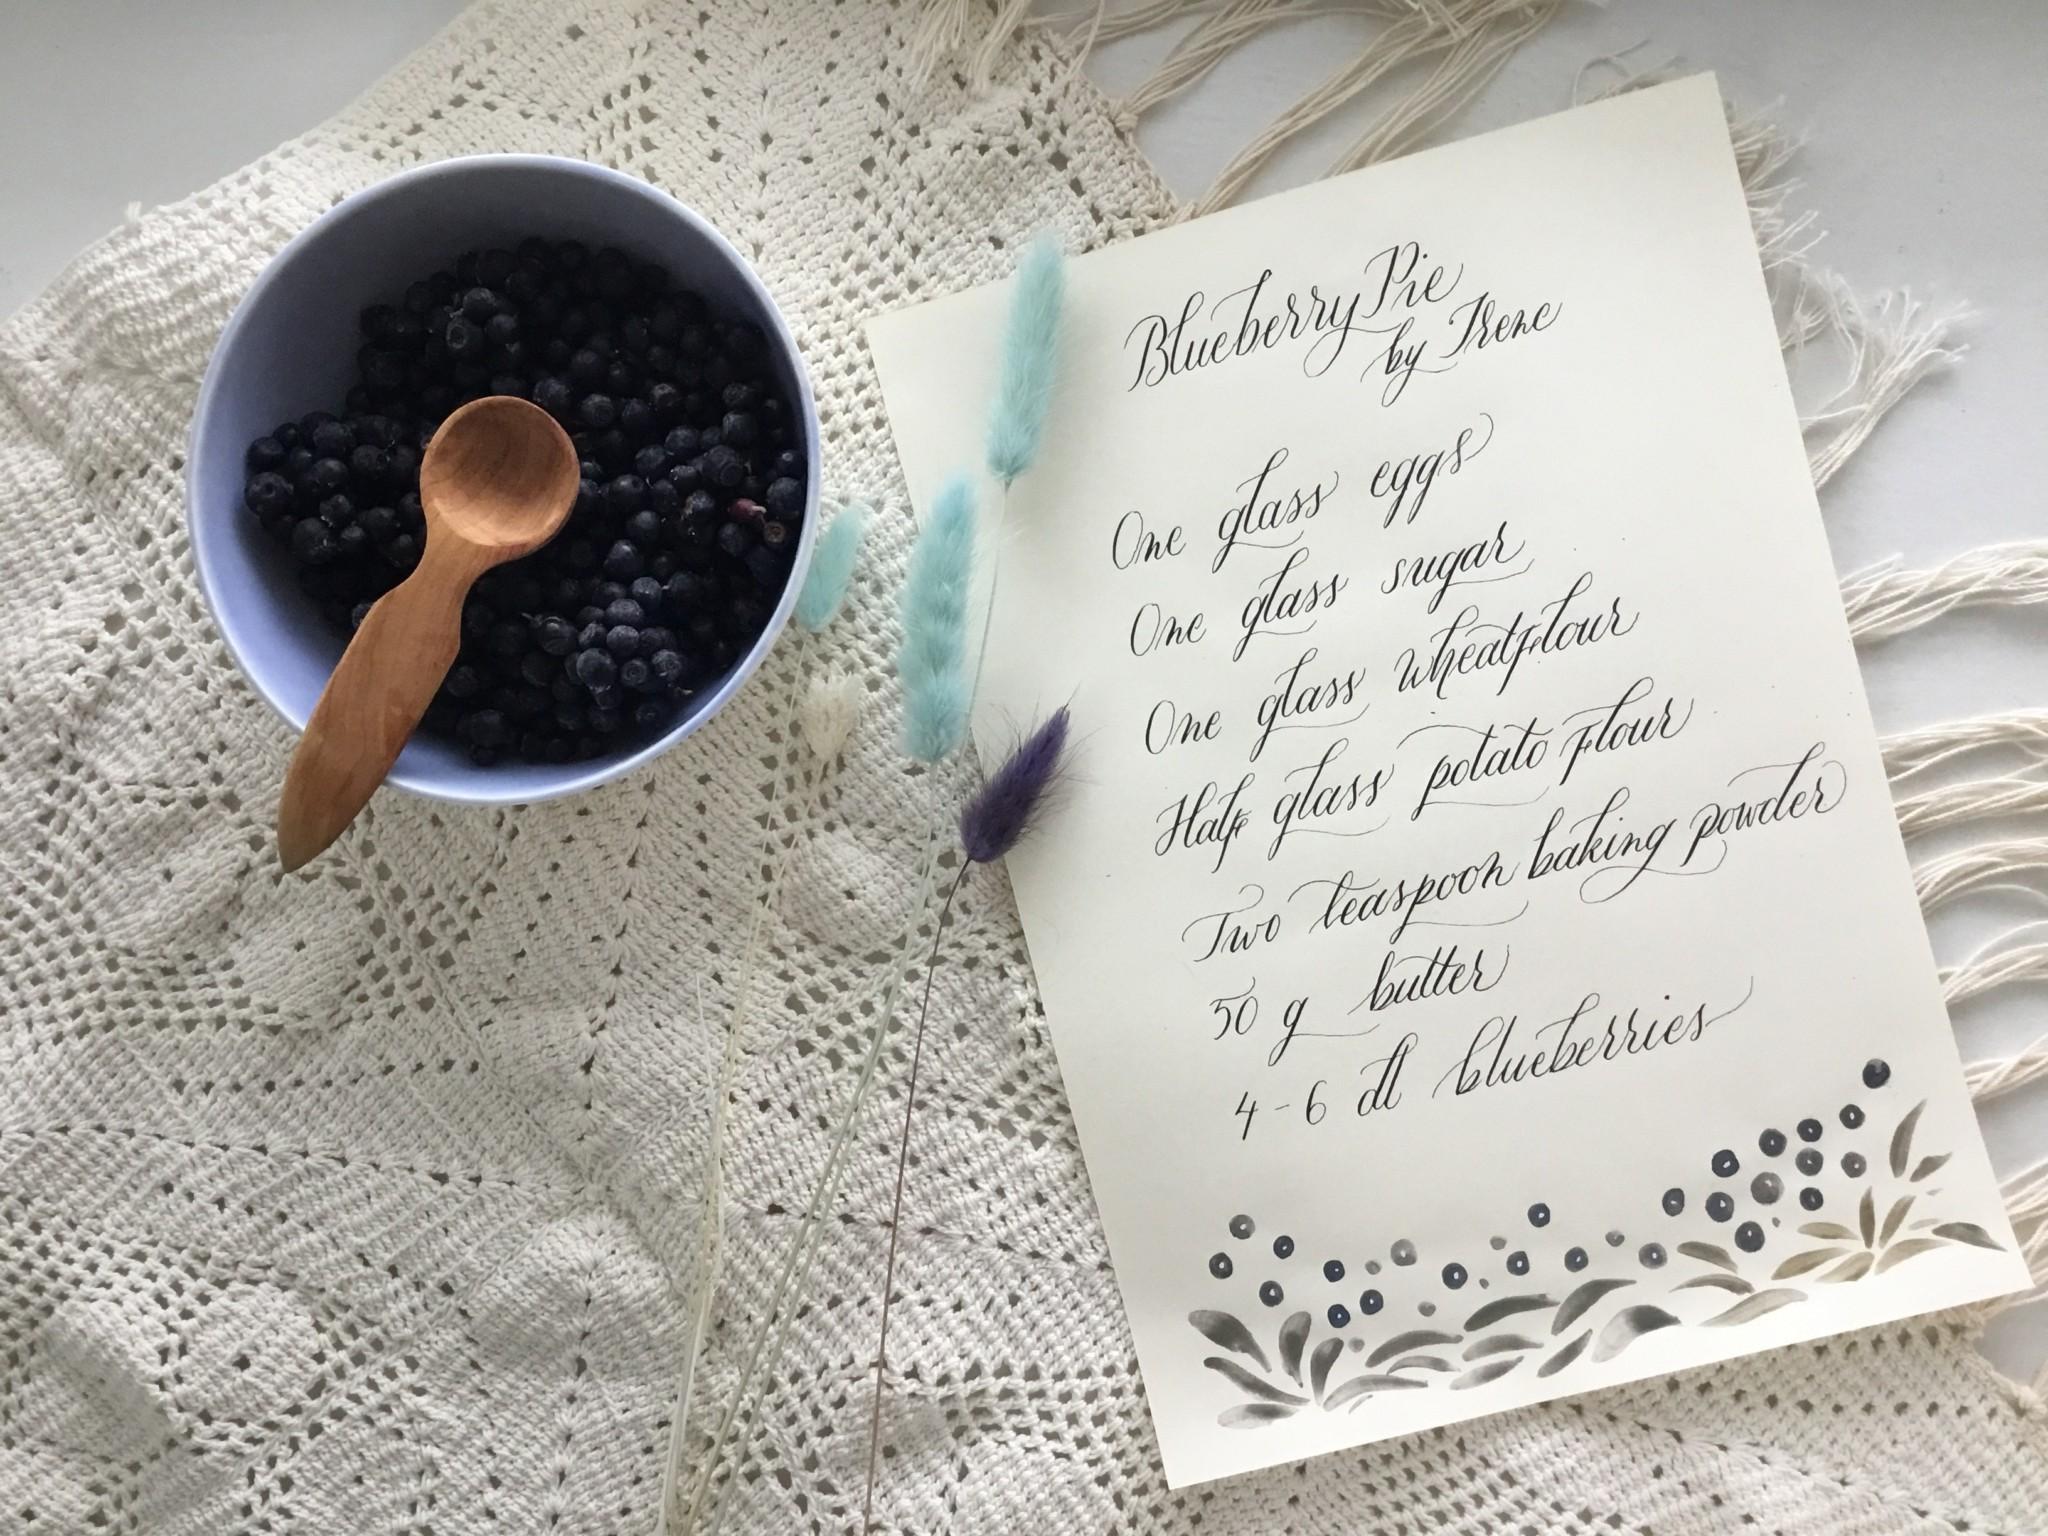 Blueberry pie recipe by Irene Kangasniemi Hornwork Rovaniemi Lapland Finland calligraphy by A-M Lampela